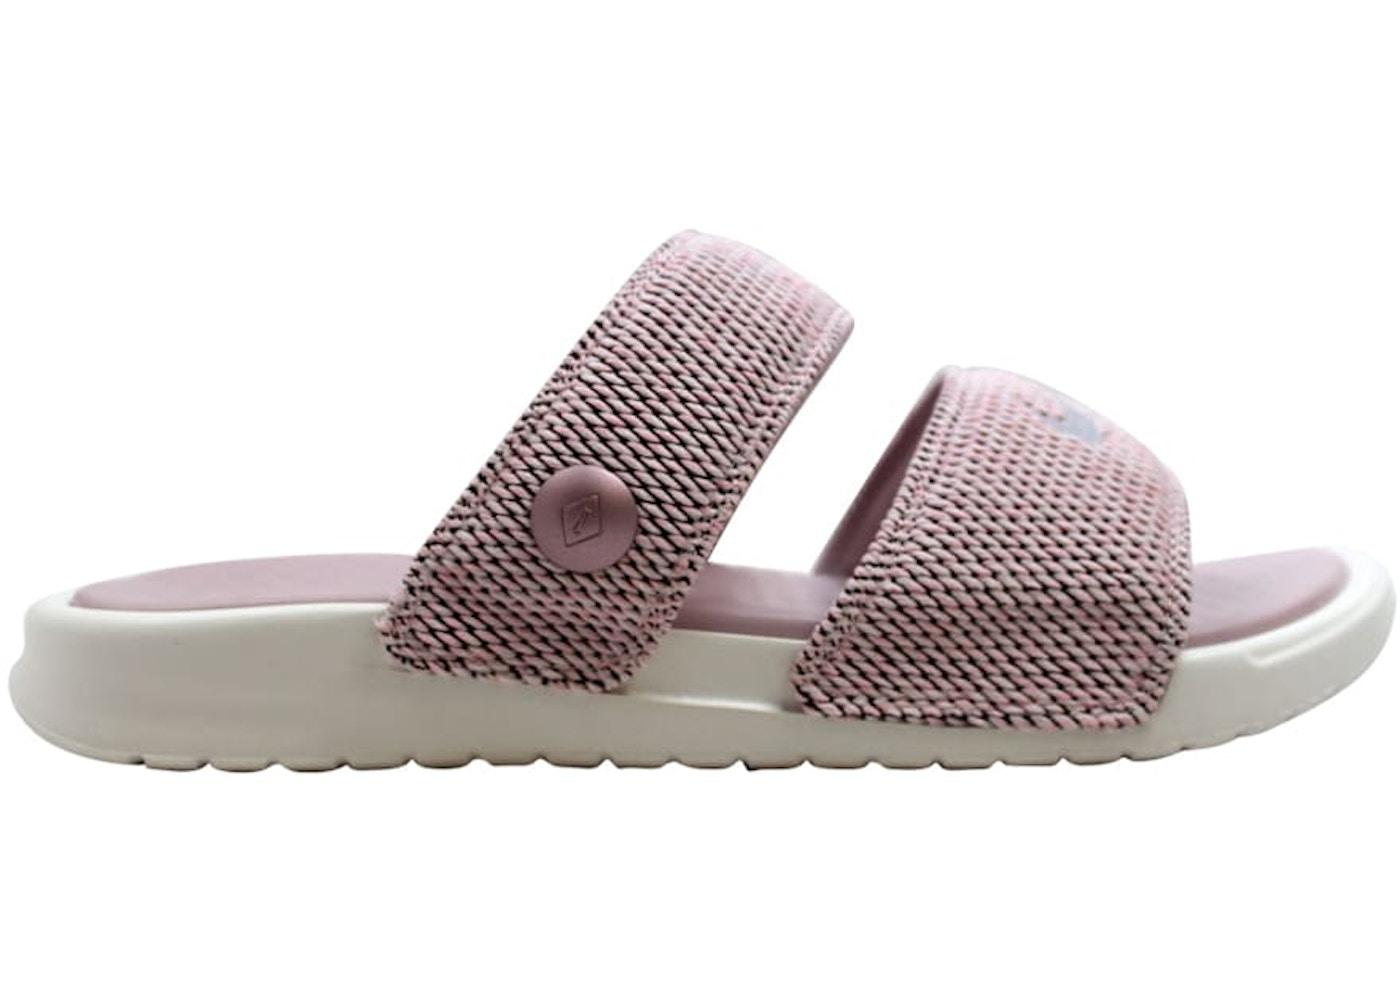 Fábula áspero Grabar  Nike Benassi Duo Ultra SLD/Pigalle NikeLab Carnation/Barely Rose-Sail -  902783-600